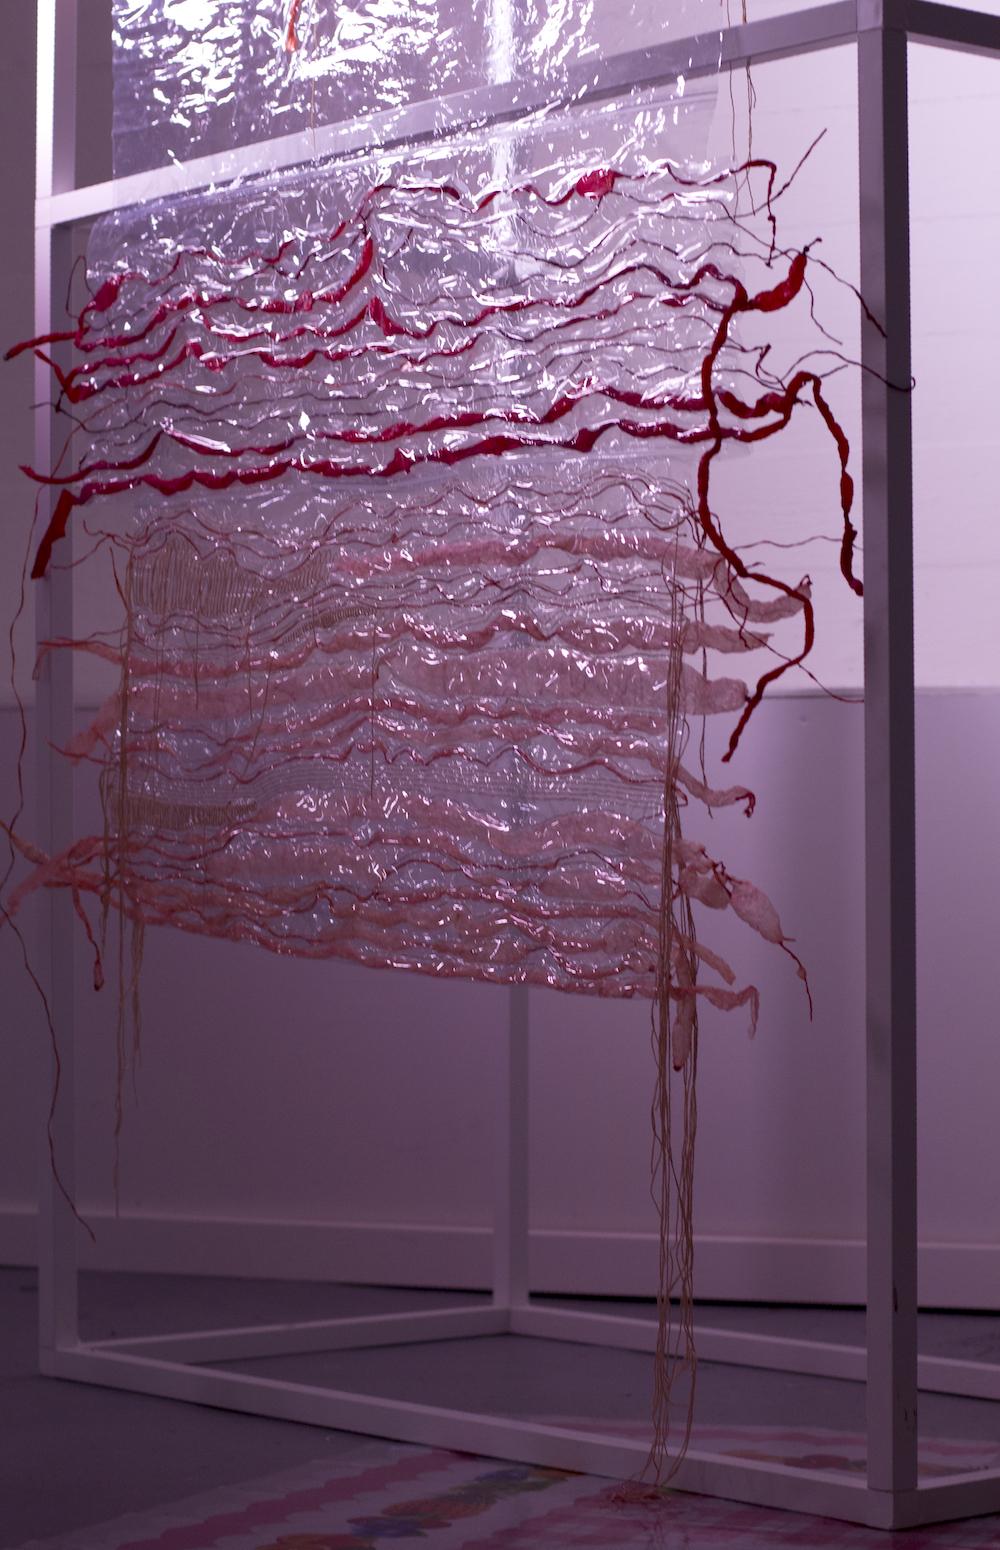 - Anna Clarisse WæhrensThe Würstel Project: Darm, 2017PVC, dyed pig intestines, thread